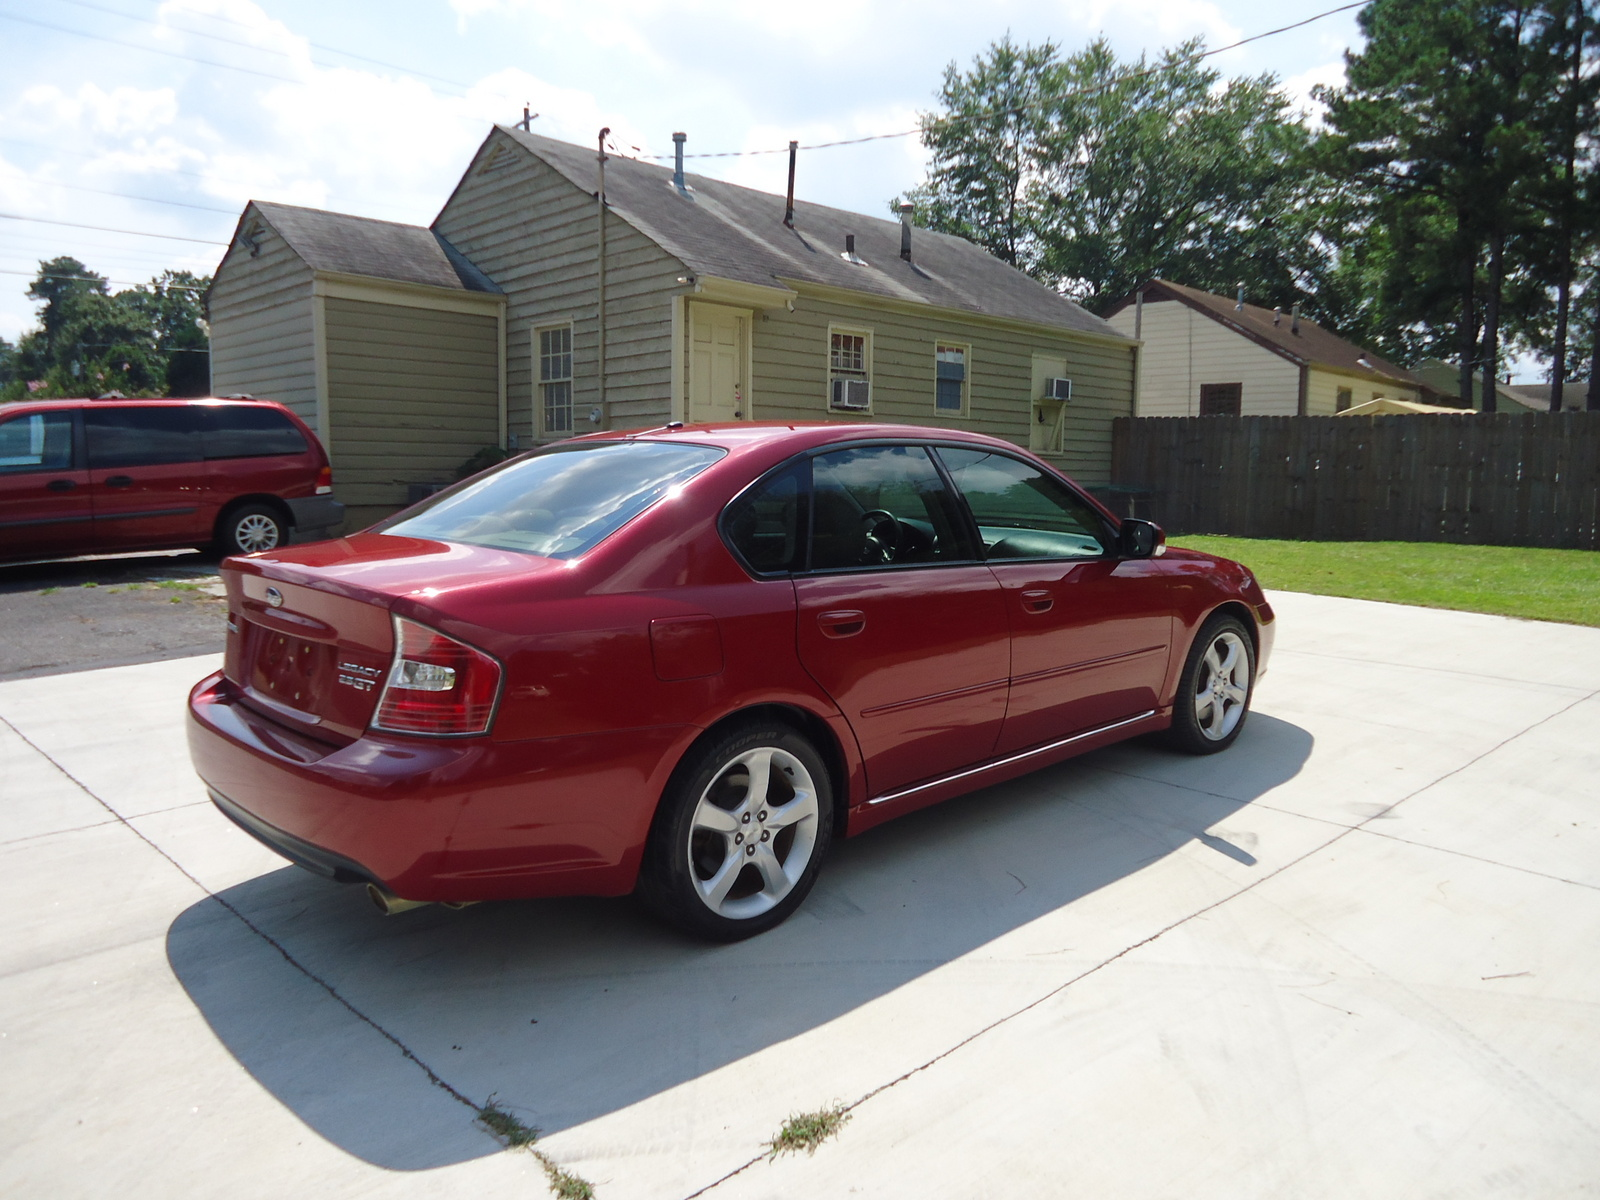 2005 Subaru Legacy - Pictures